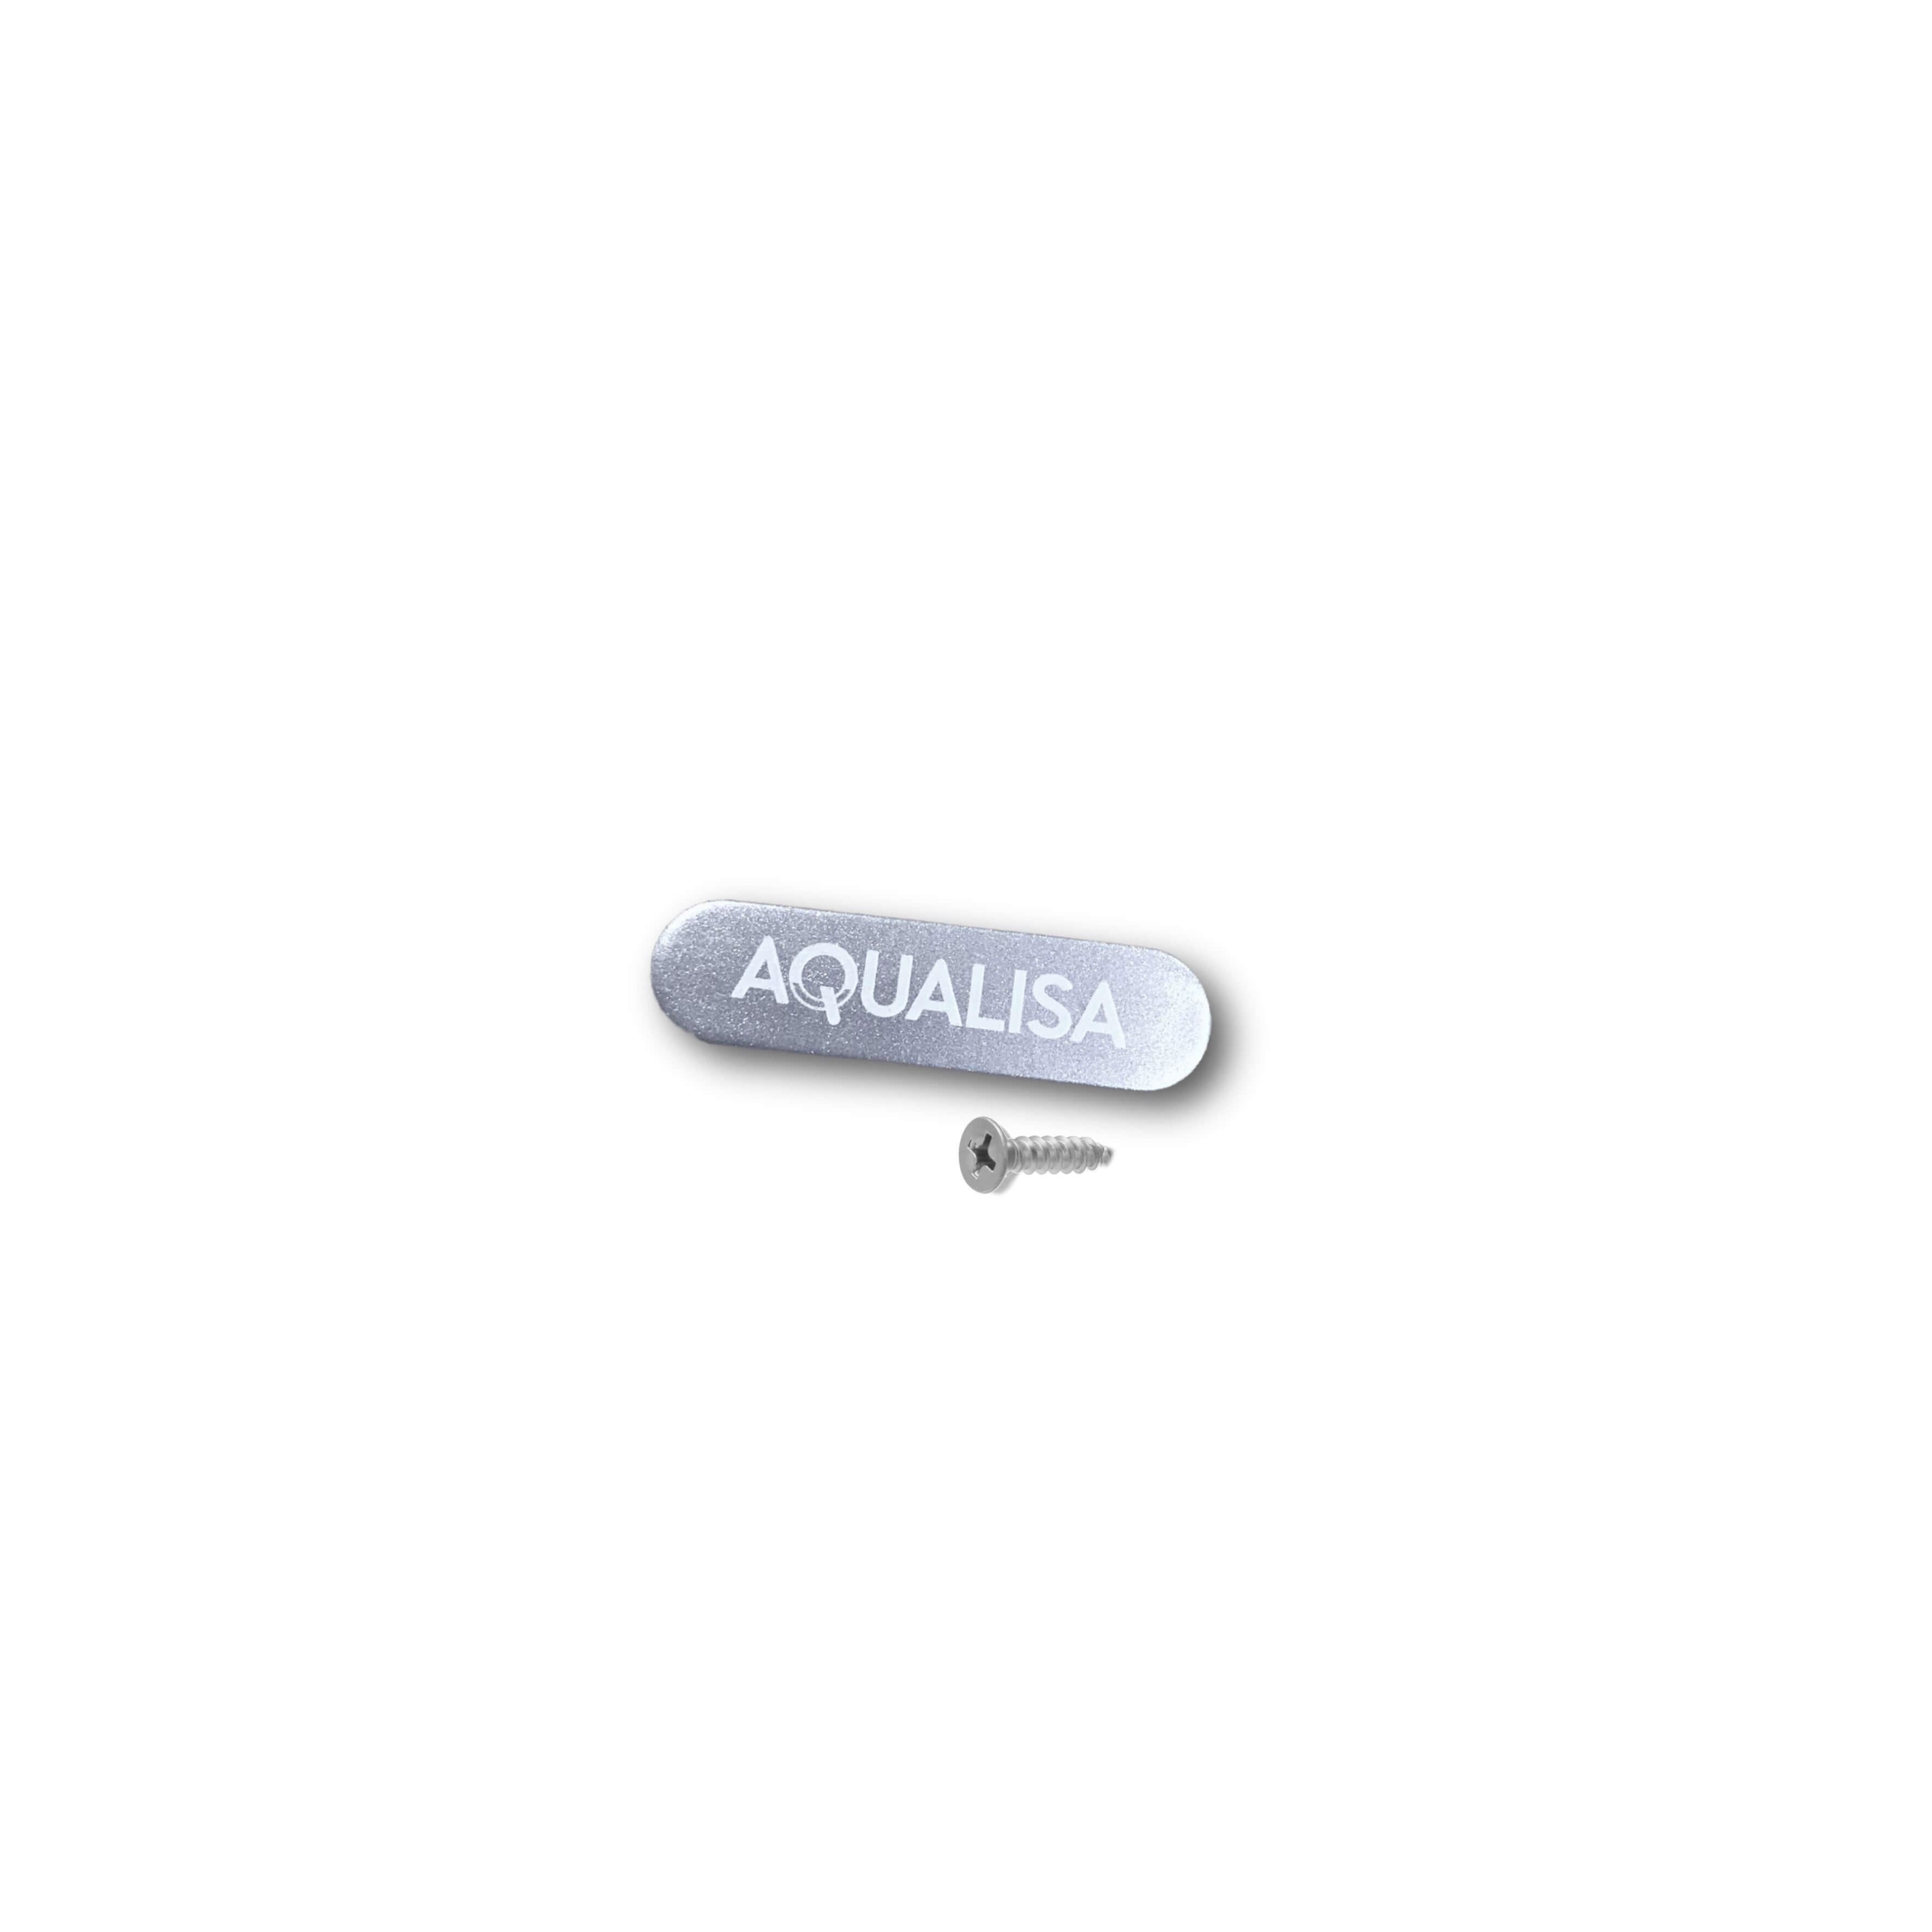 Aqualisa 213024 Badge